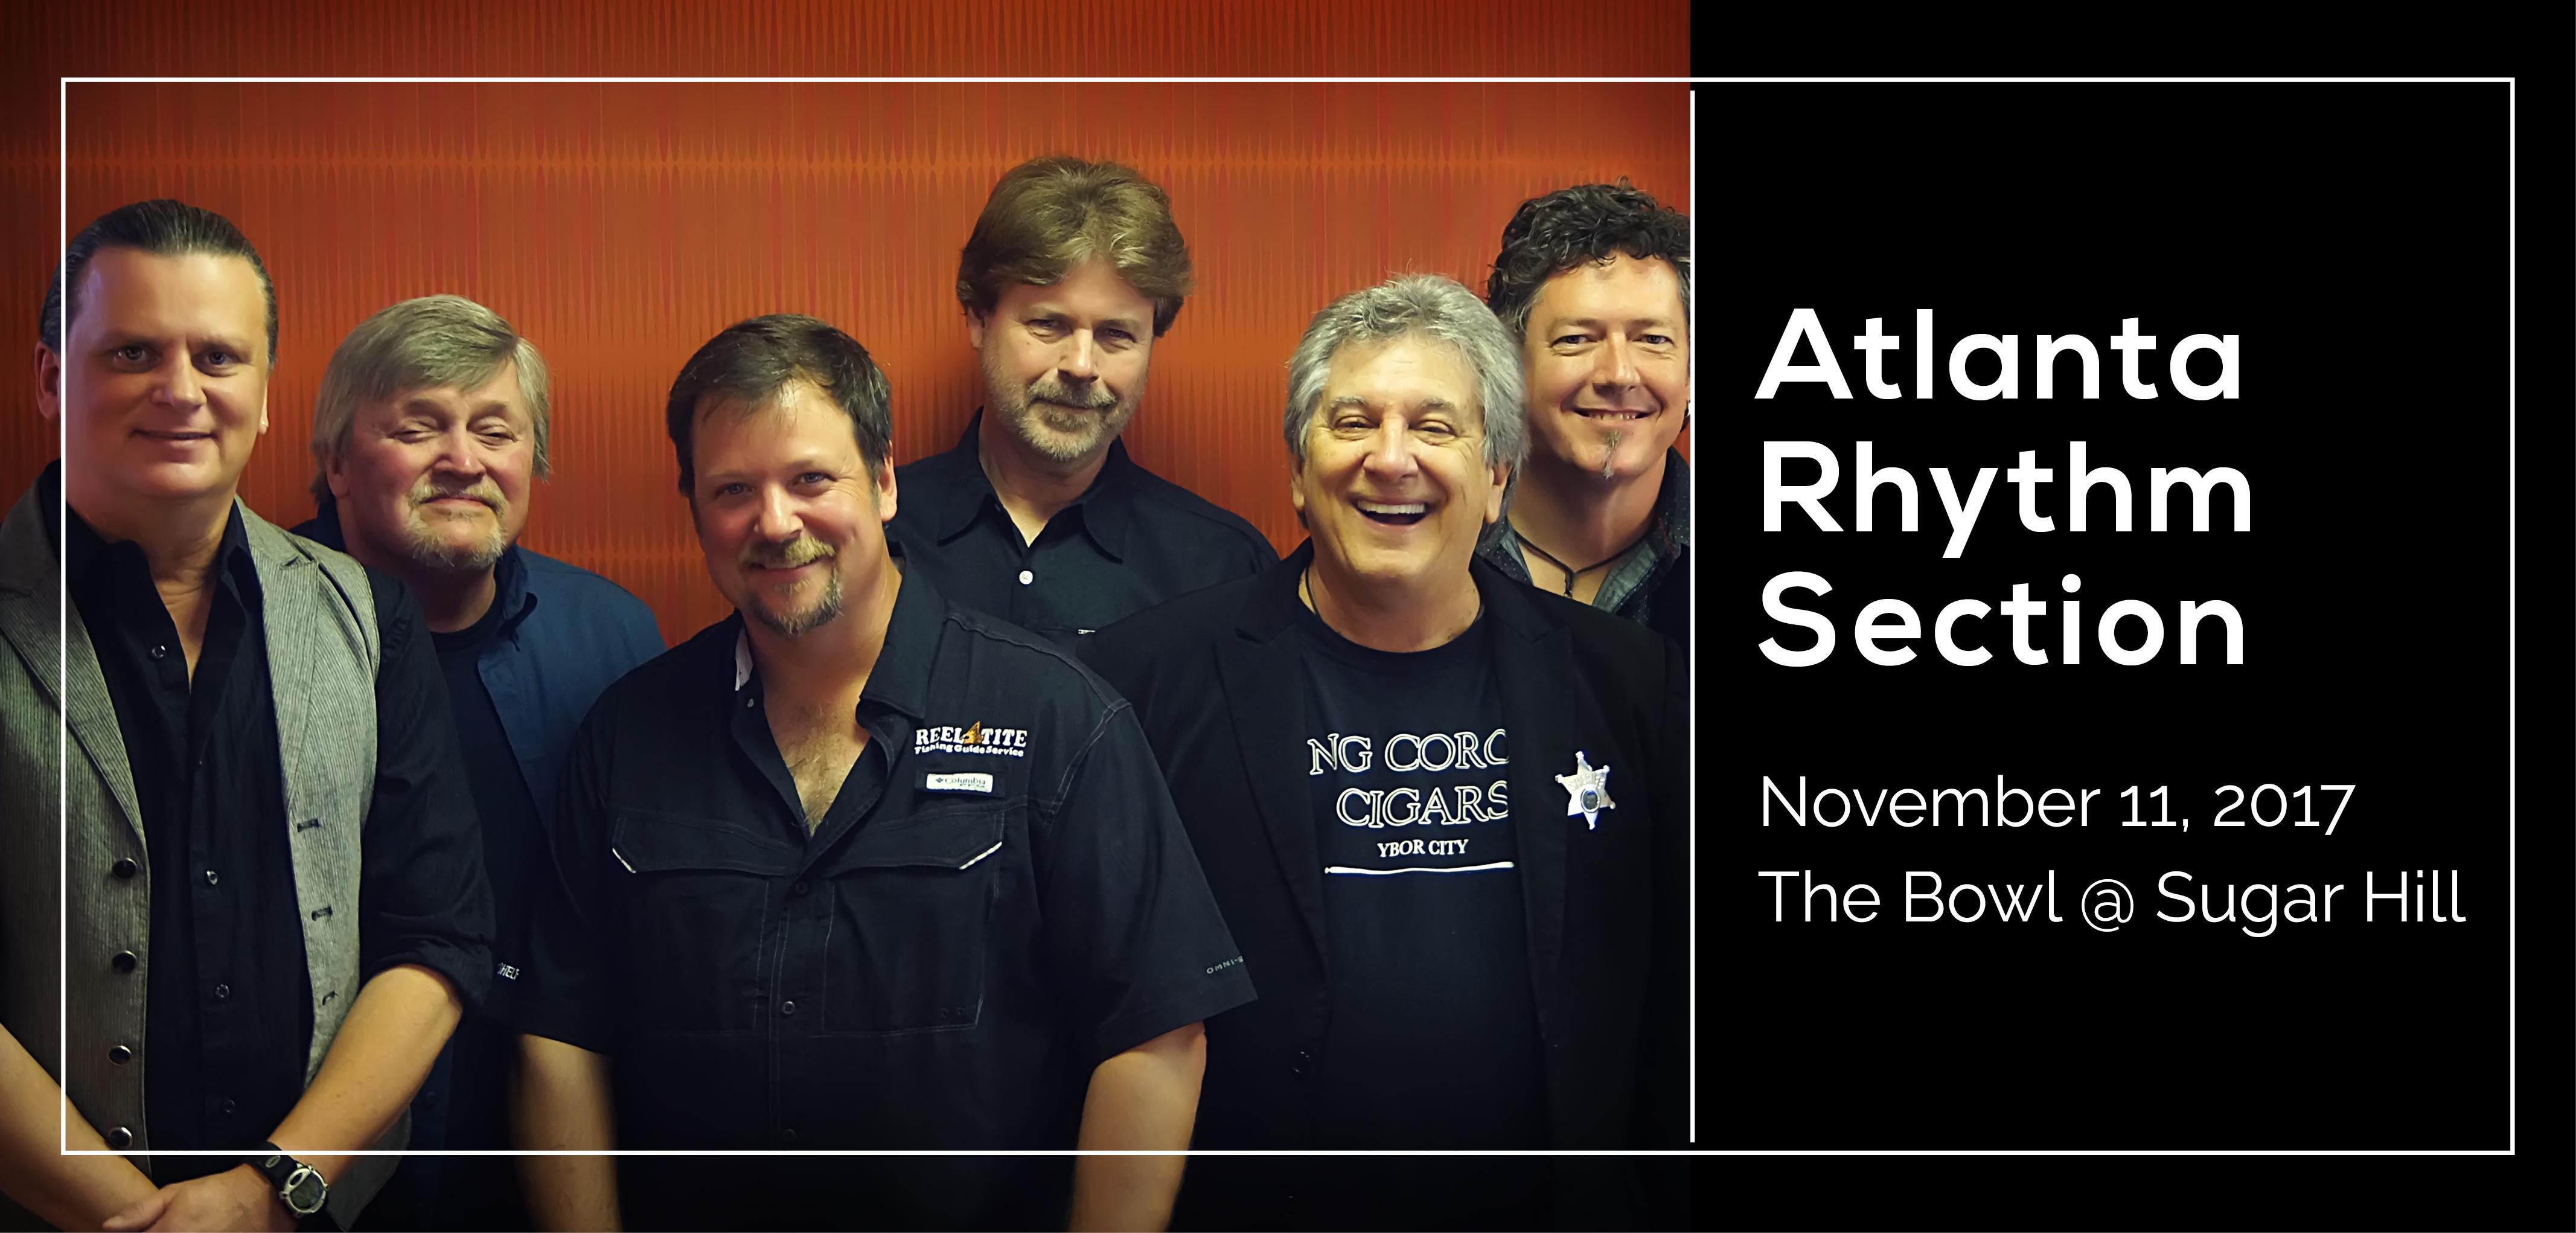 Atlanta Rhythm Section 28 Images Atlanta Rhythm Section Bassist Paul Goddard Dies At 68